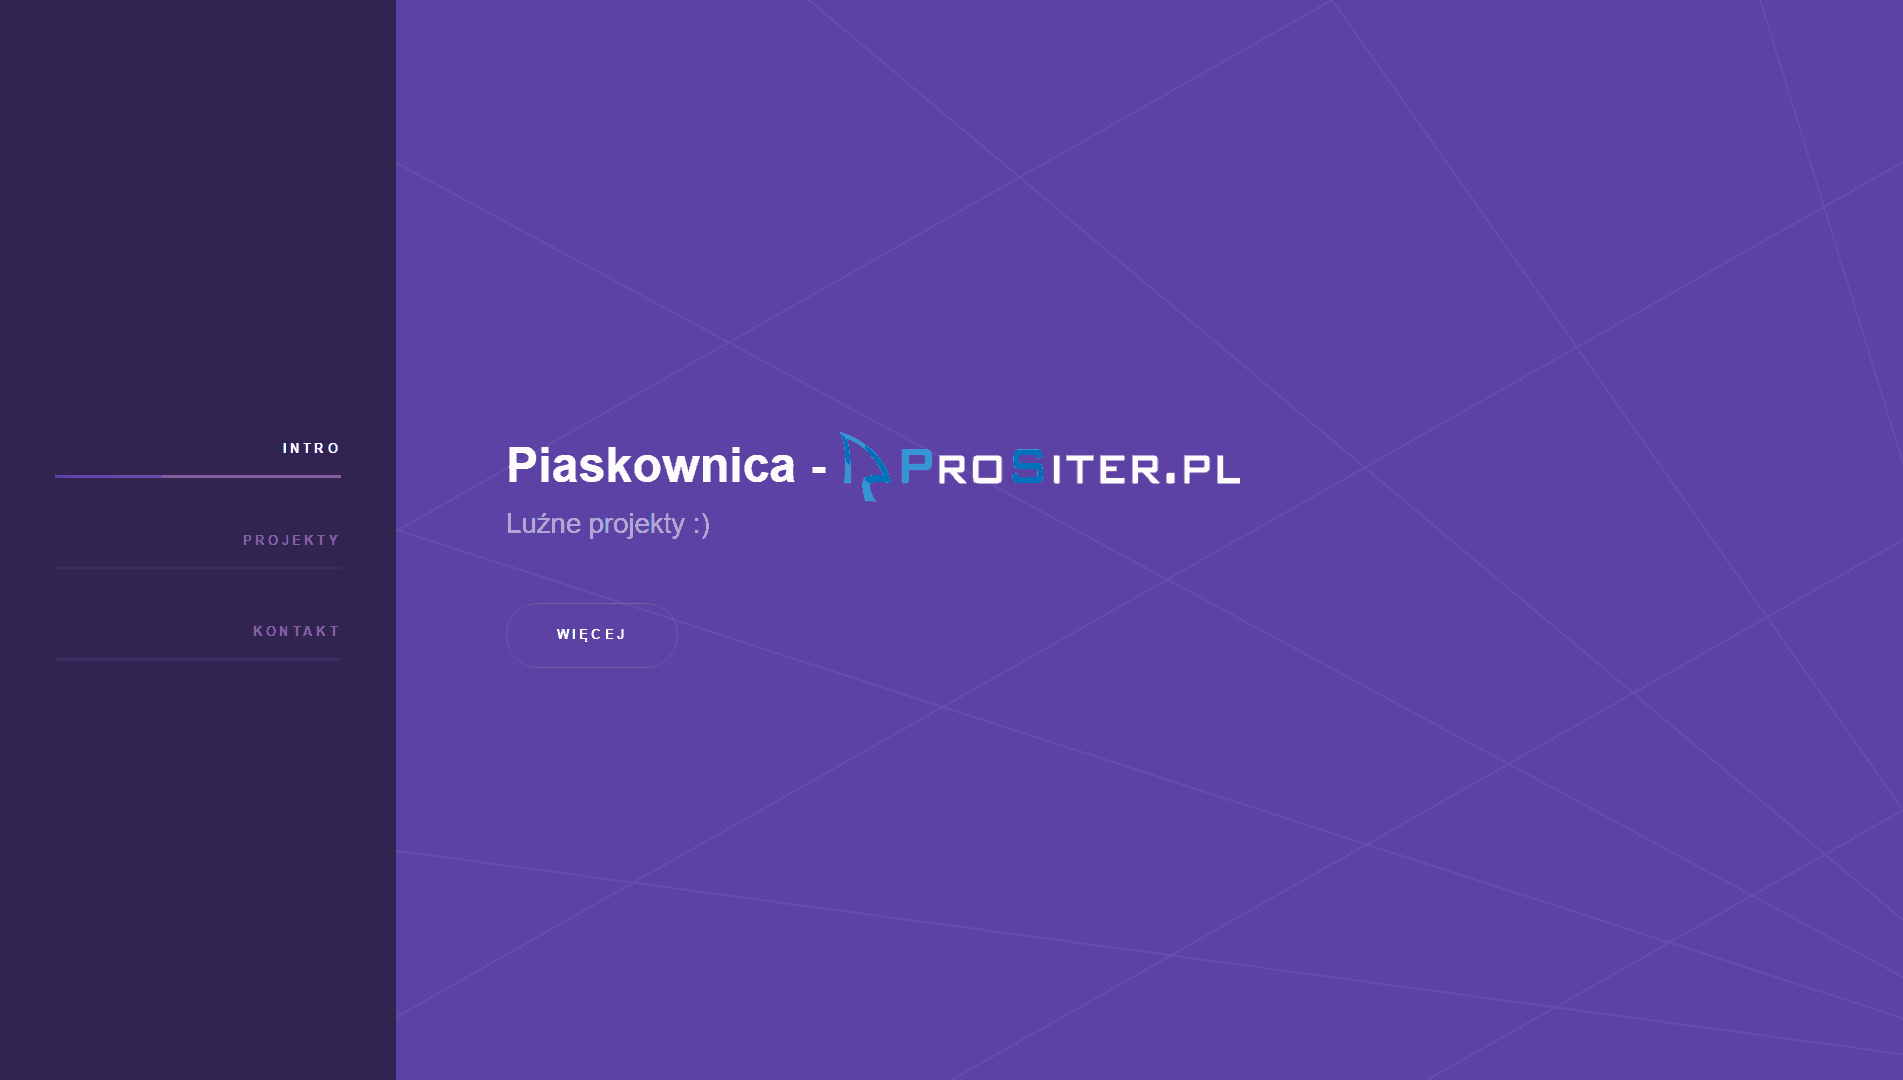 Piaskownica ProSiter.pl